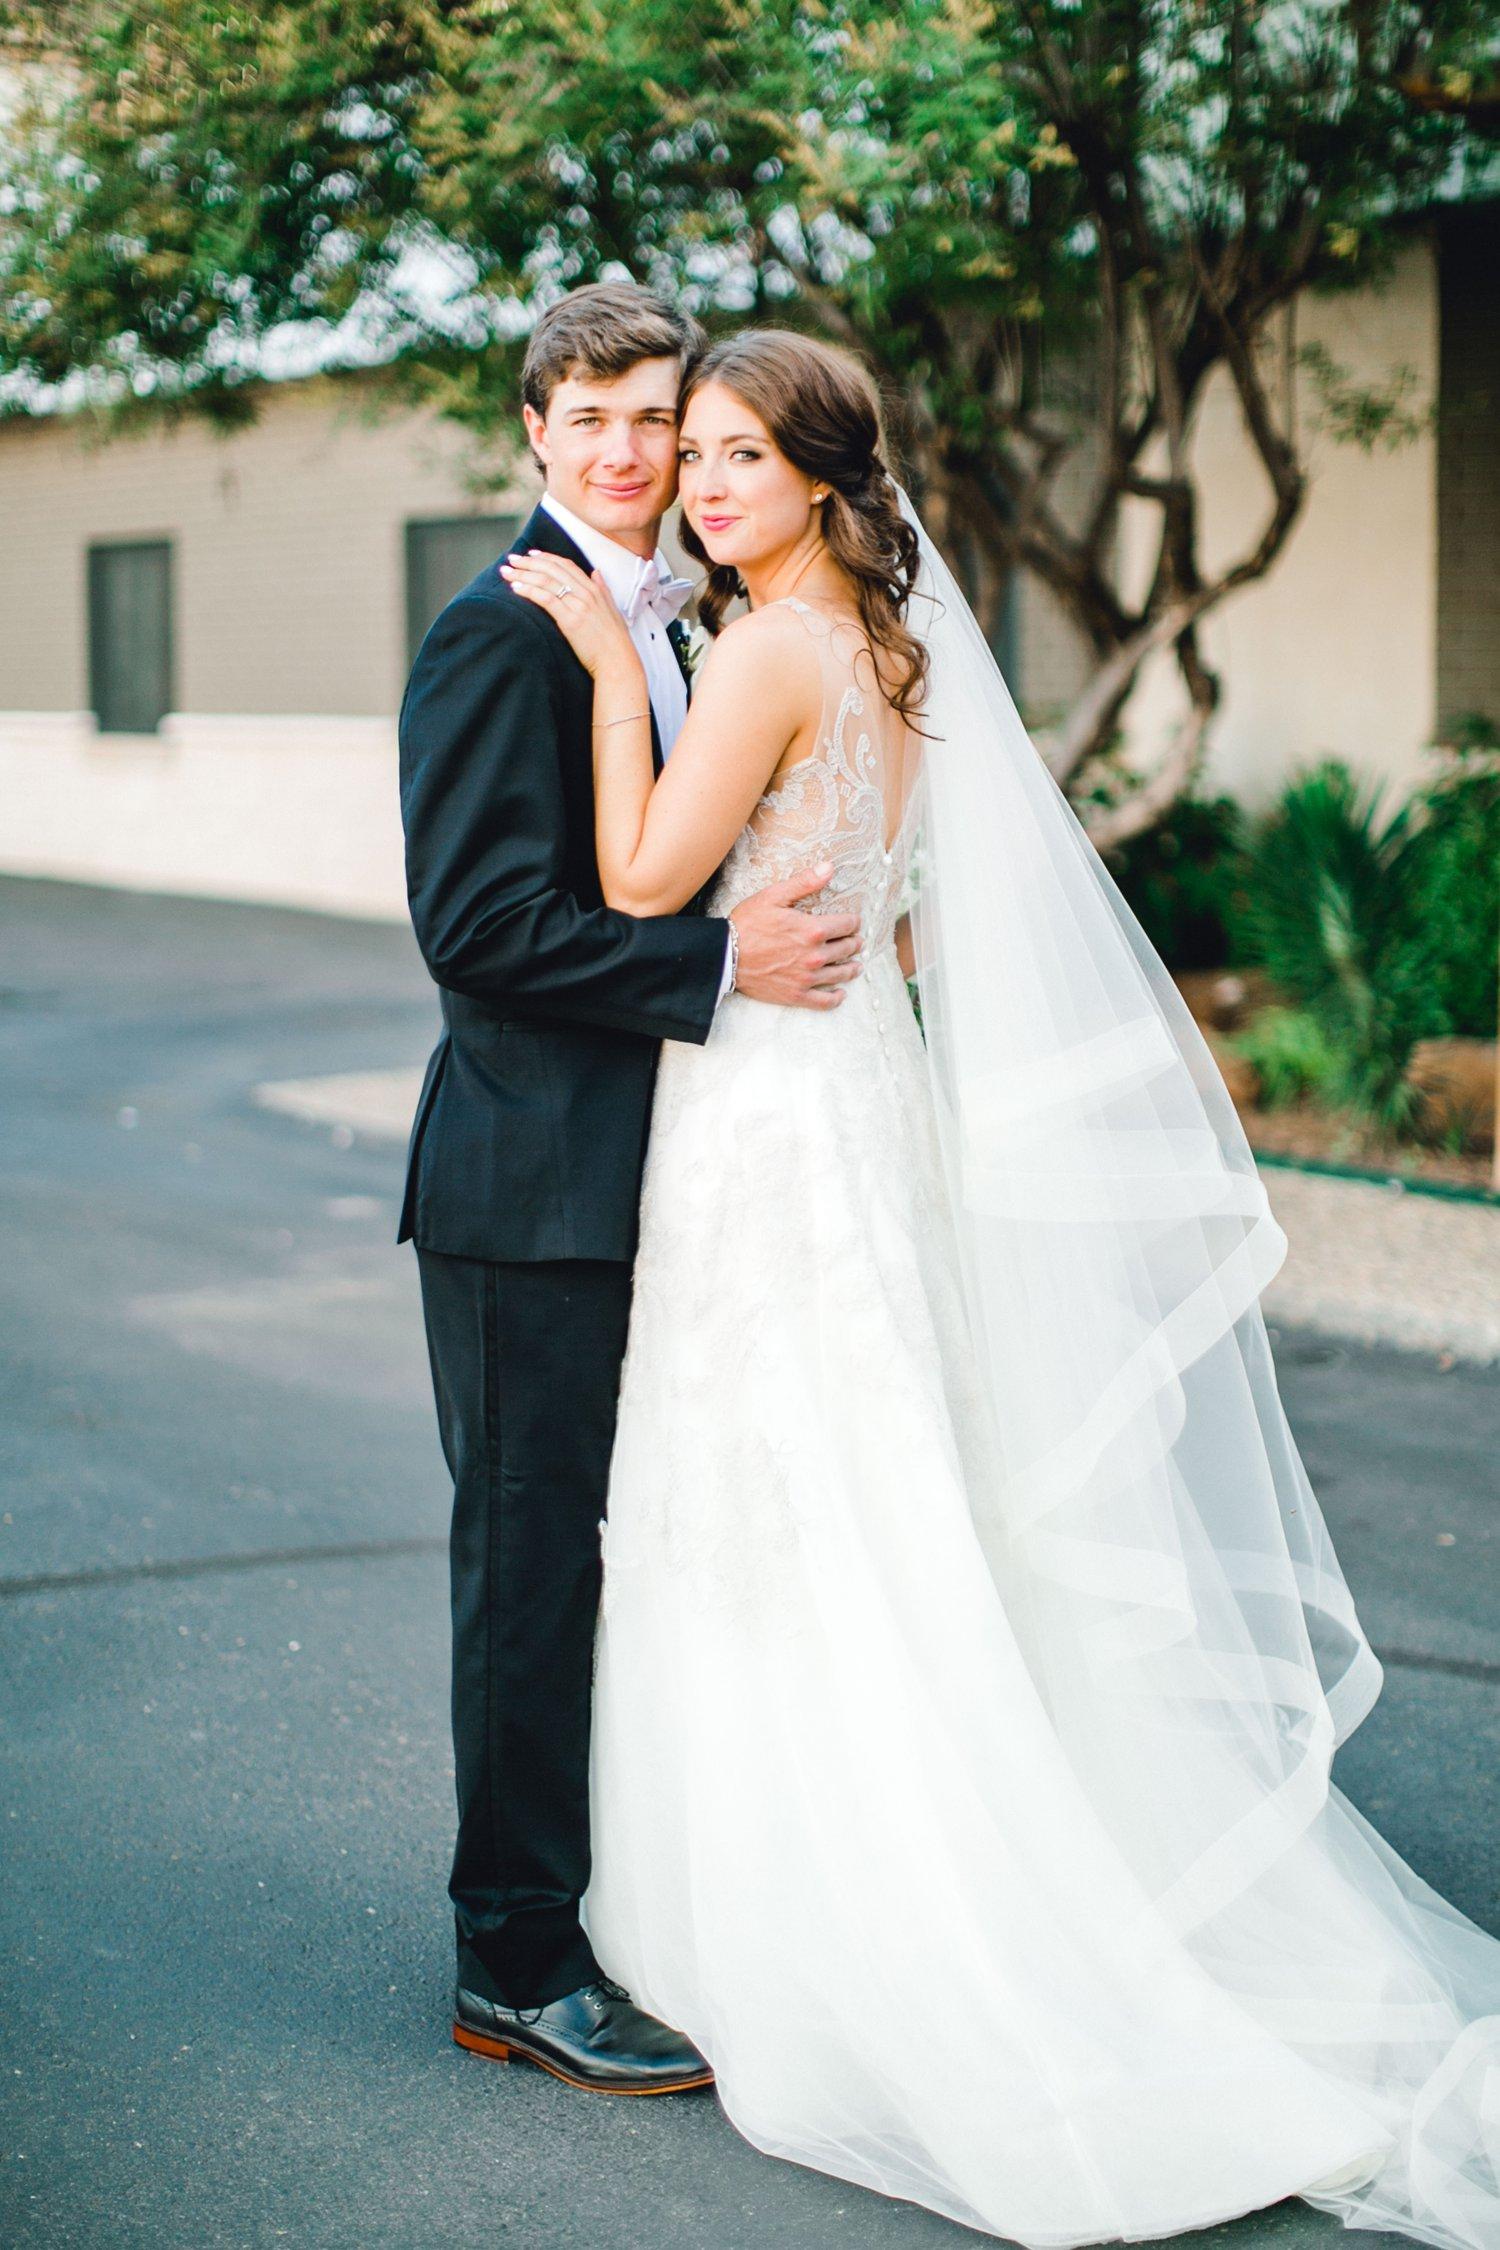 Hunter_and_Molly_Rawls_ALLEEJ_Lubbock_WEDDING_Legacy_Event_Center_0140.jpg